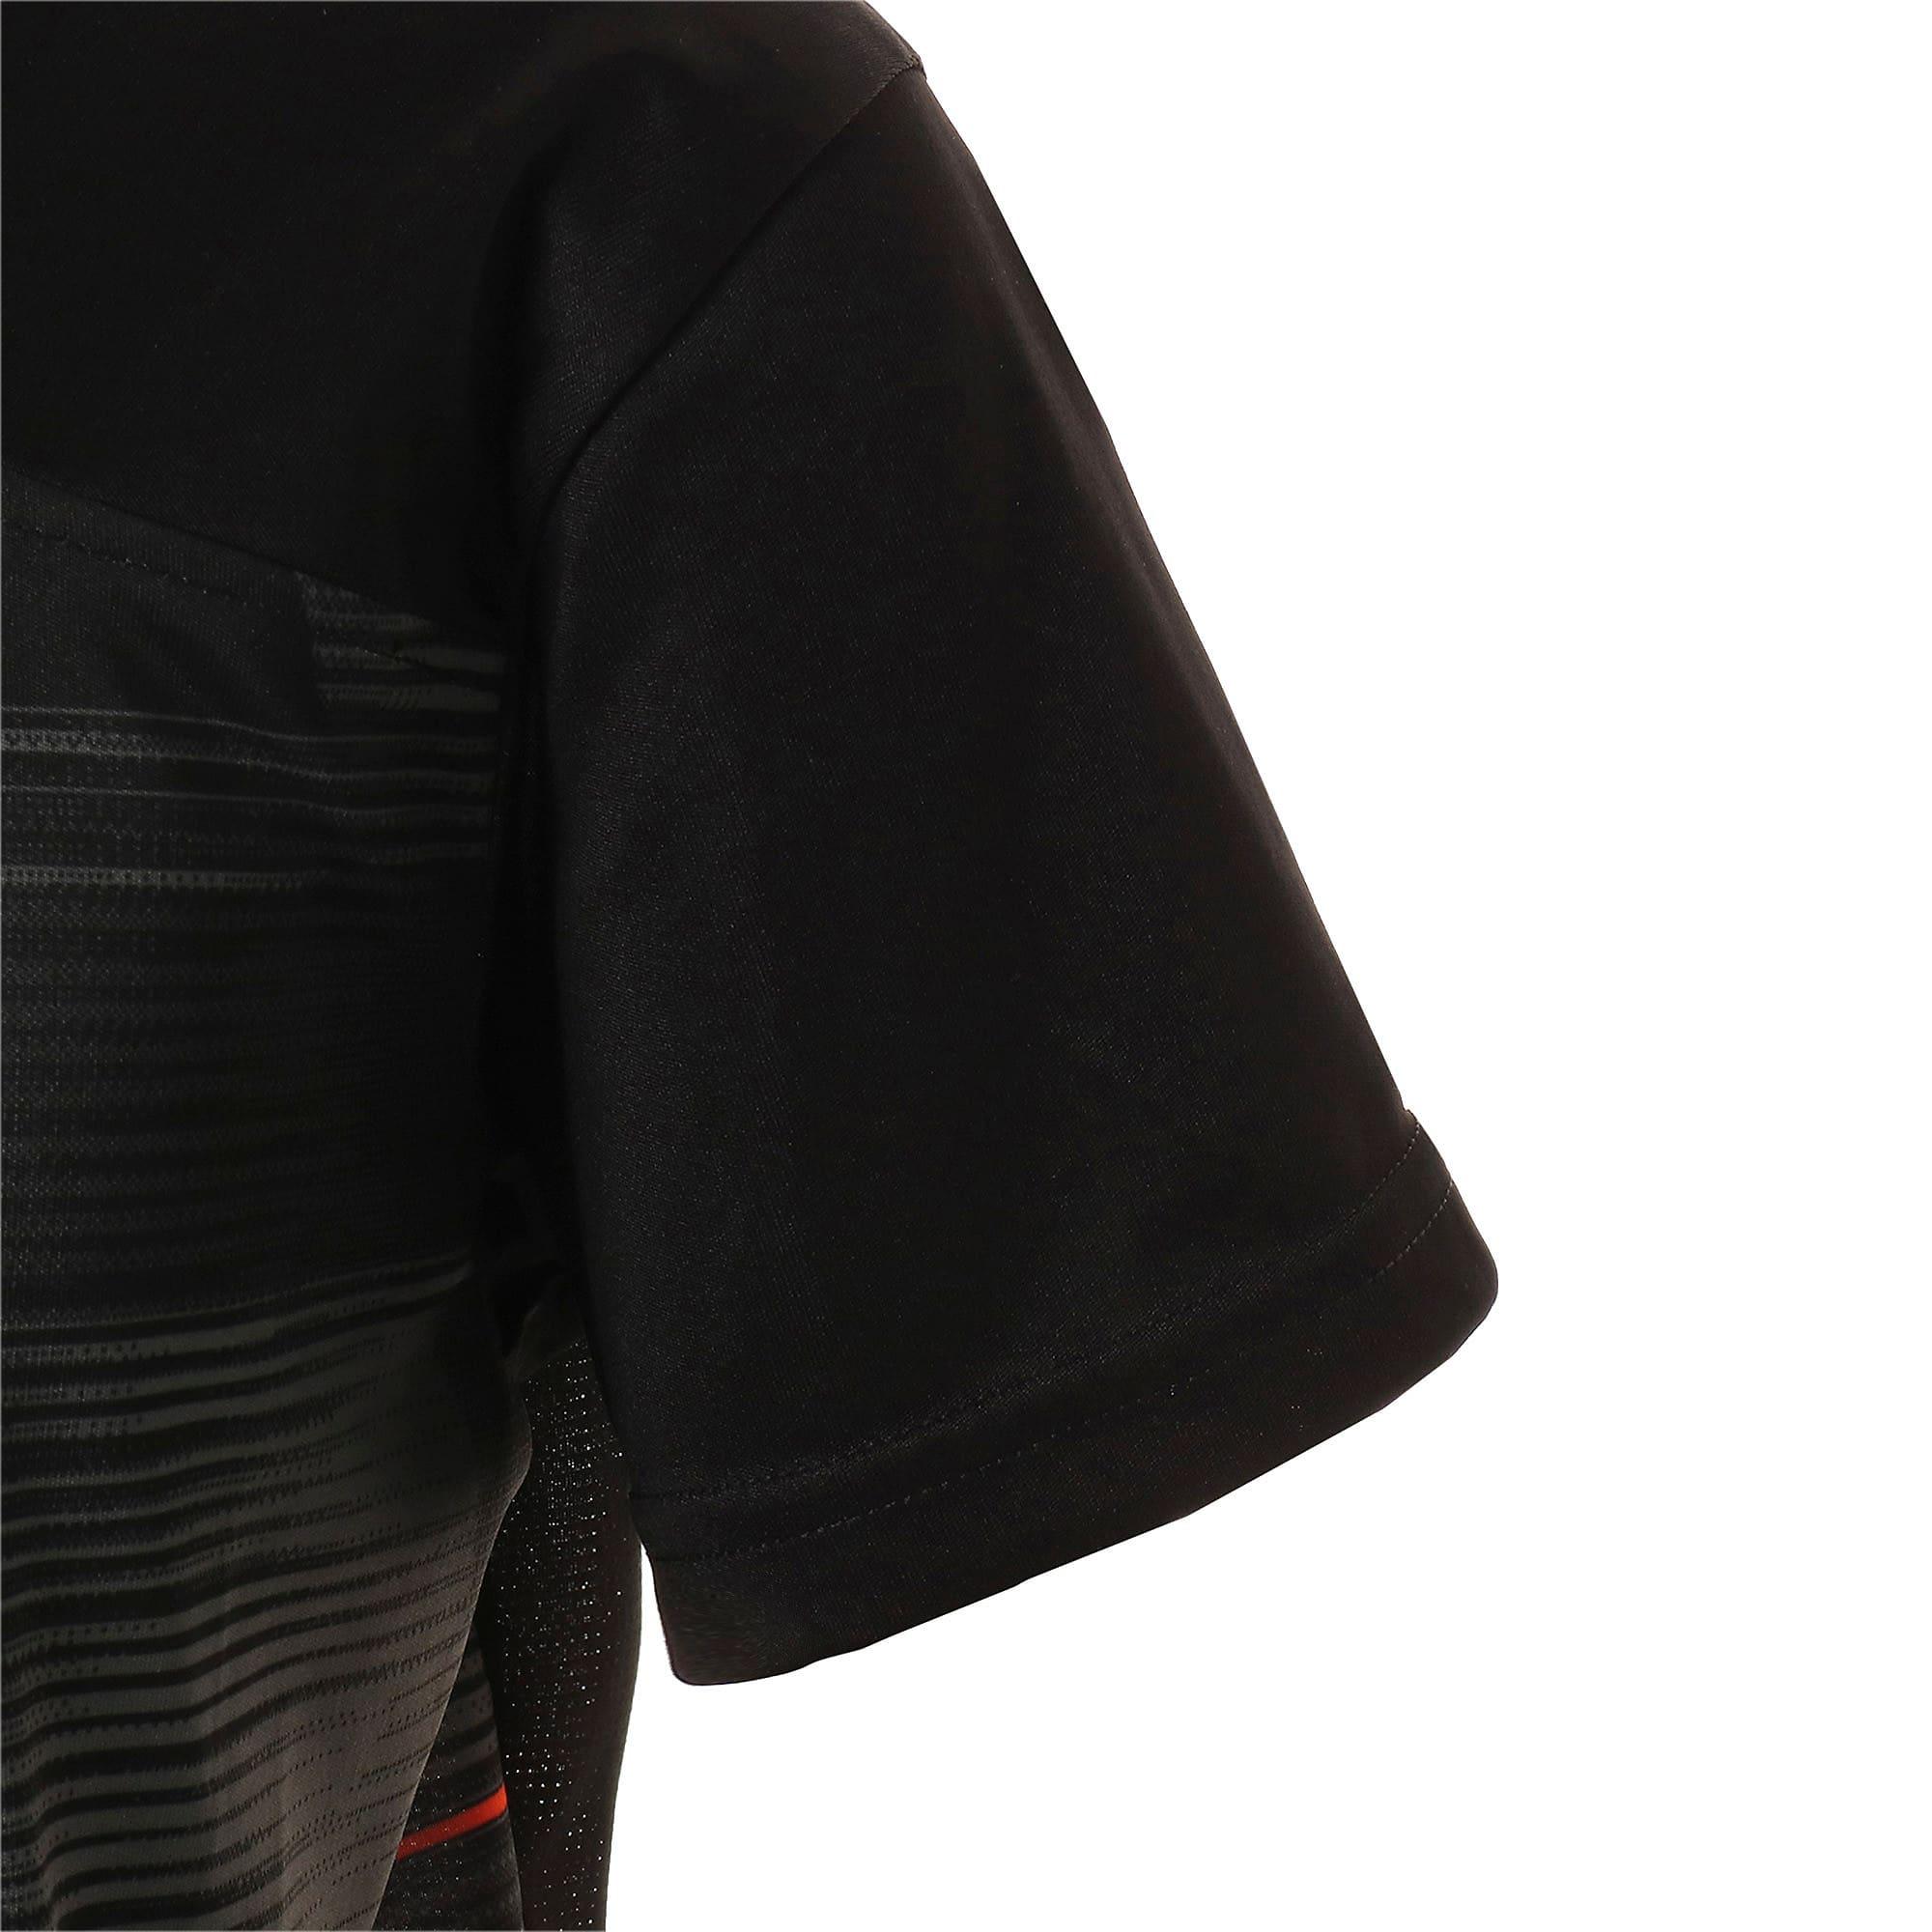 Thumbnail 5 of キッズ FTBLNXT ジュニア グラフィック シャツ, Puma Black-Nrgy Red, medium-JPN